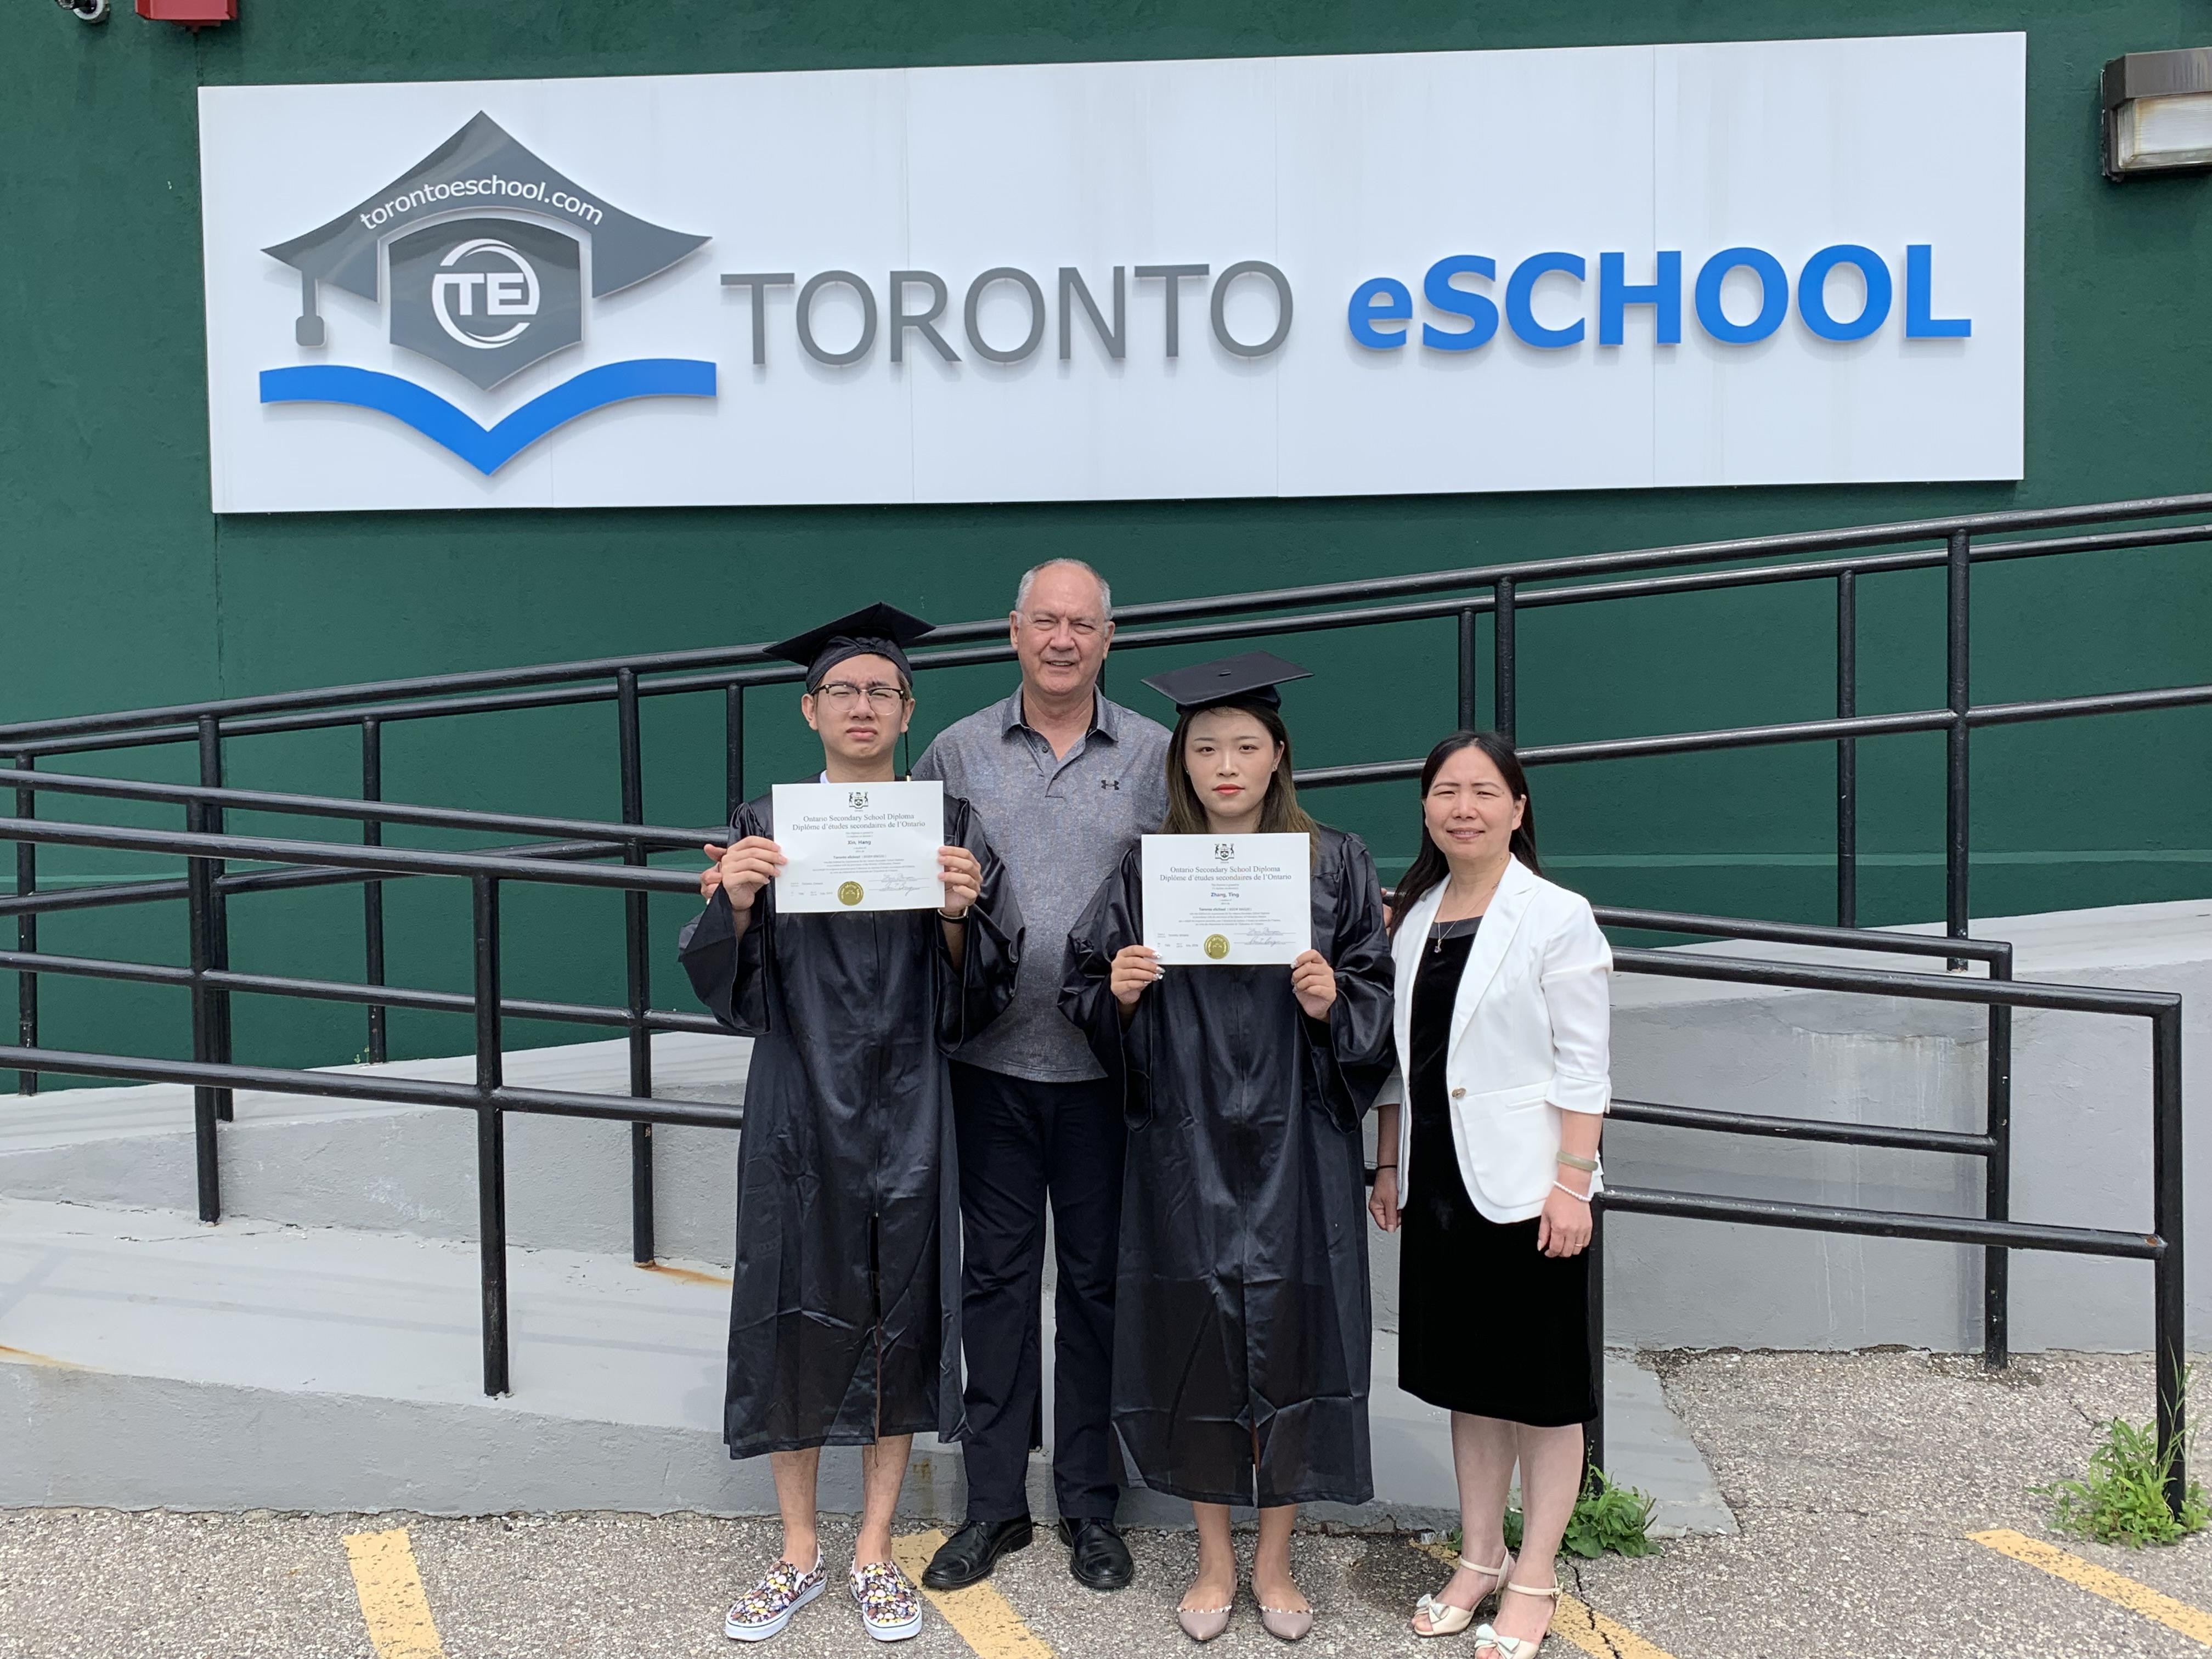 TorontoeSchool OSSD